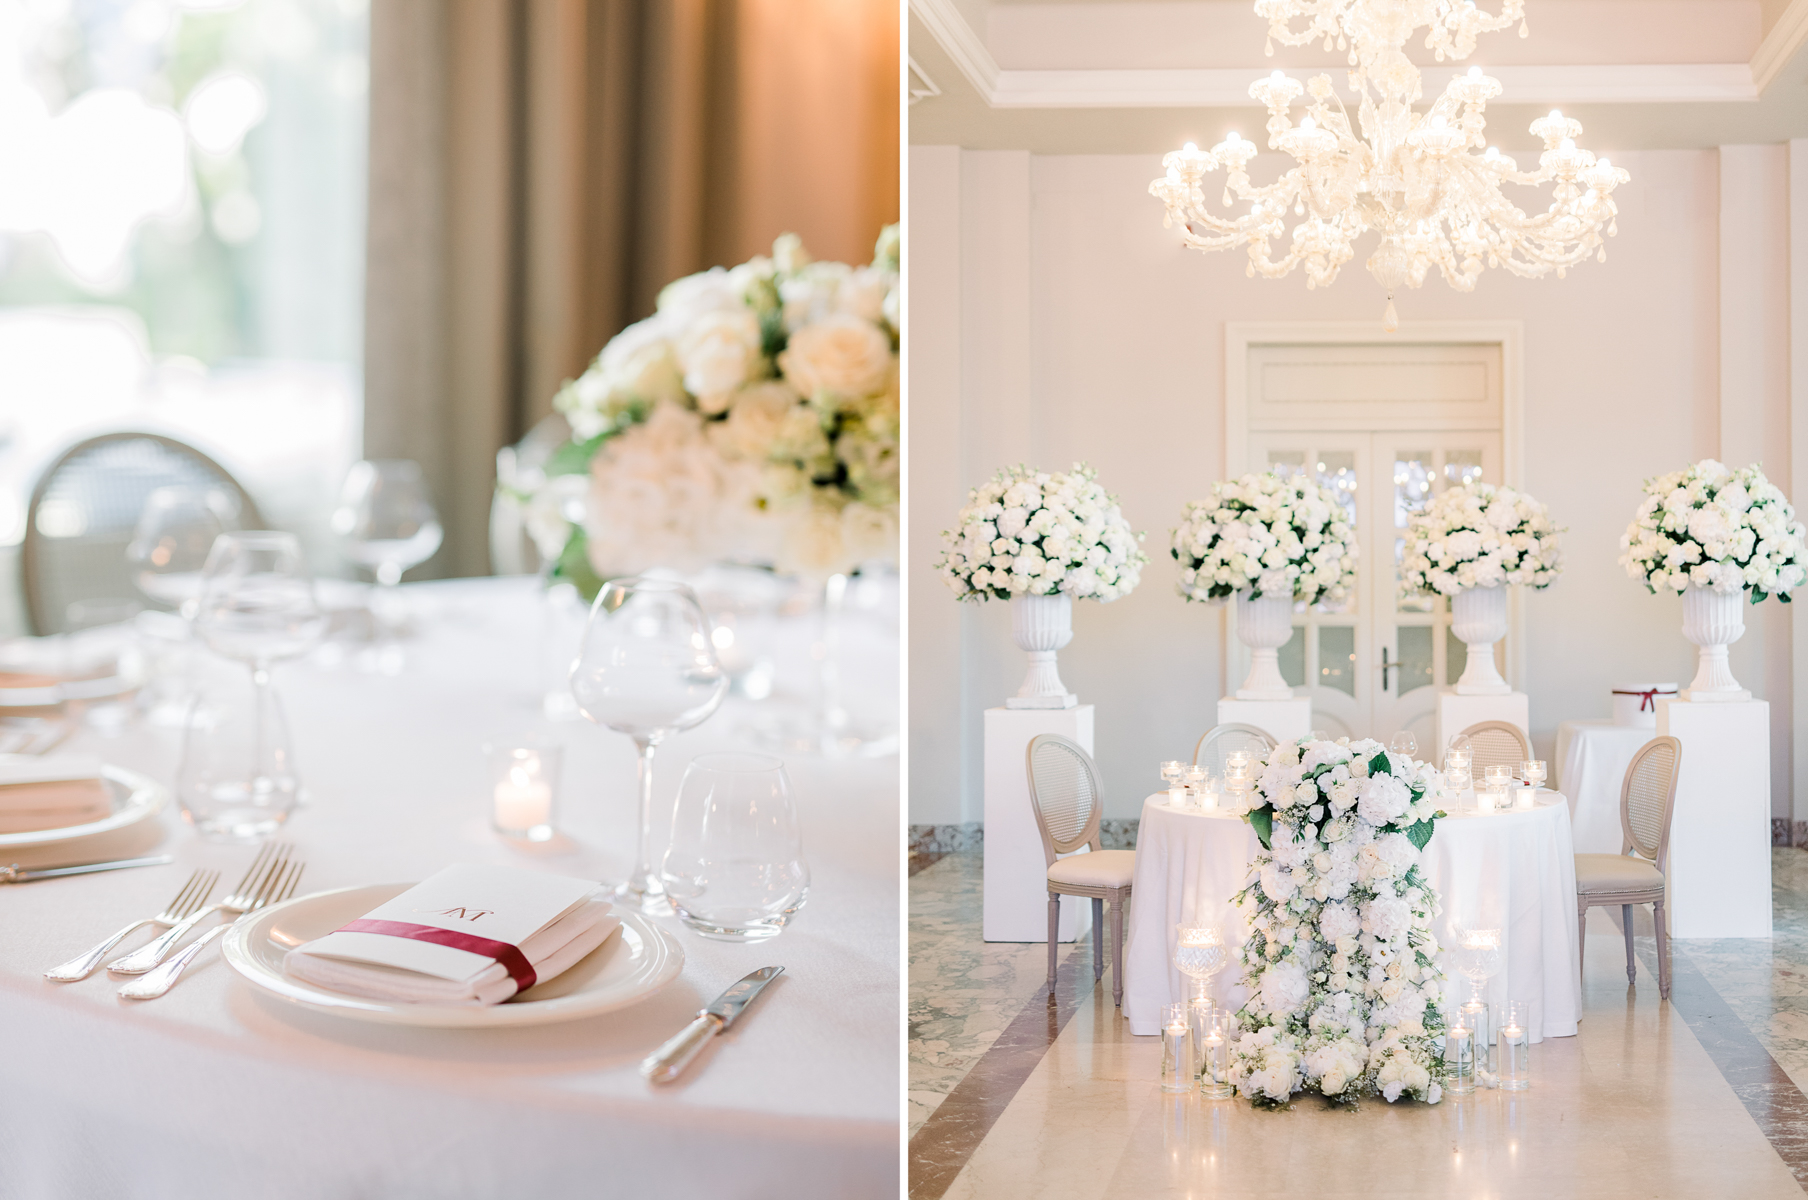 Palace_Villa_Cortine_Hotel_Italian_Wedding_Photographer_Sirmione_AKP-42.jpg